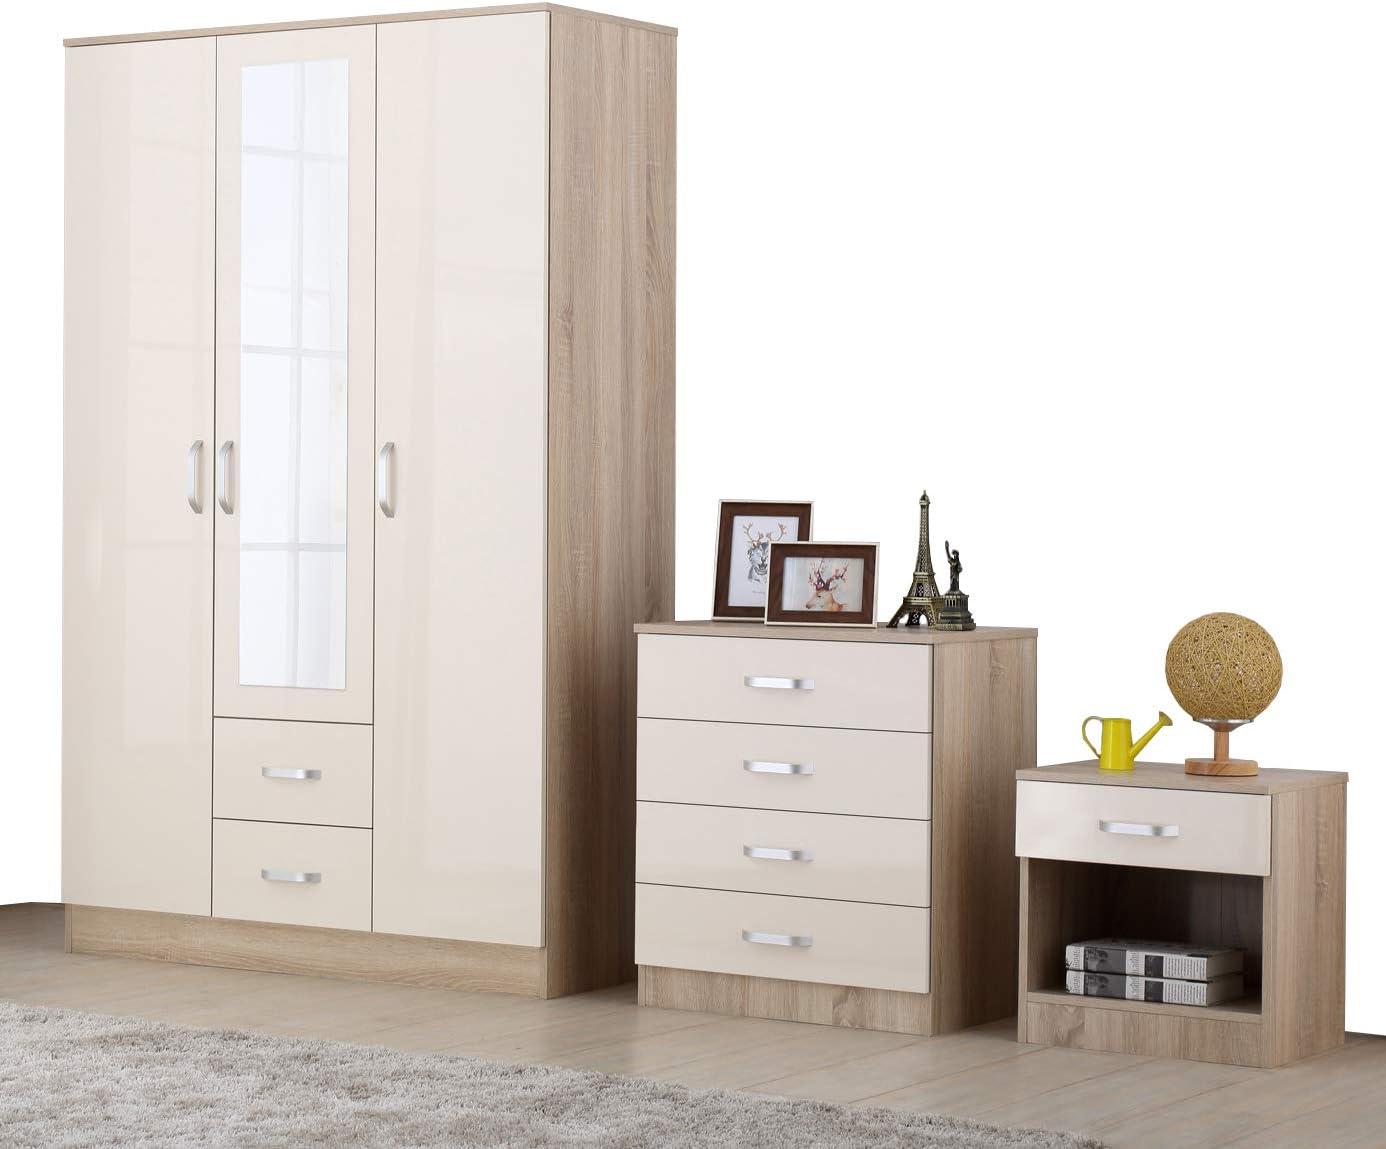 Cream Oak High Gloss 6 Piece Trio Bedroom Furniture Set - Wardrobe Chest  Bedside